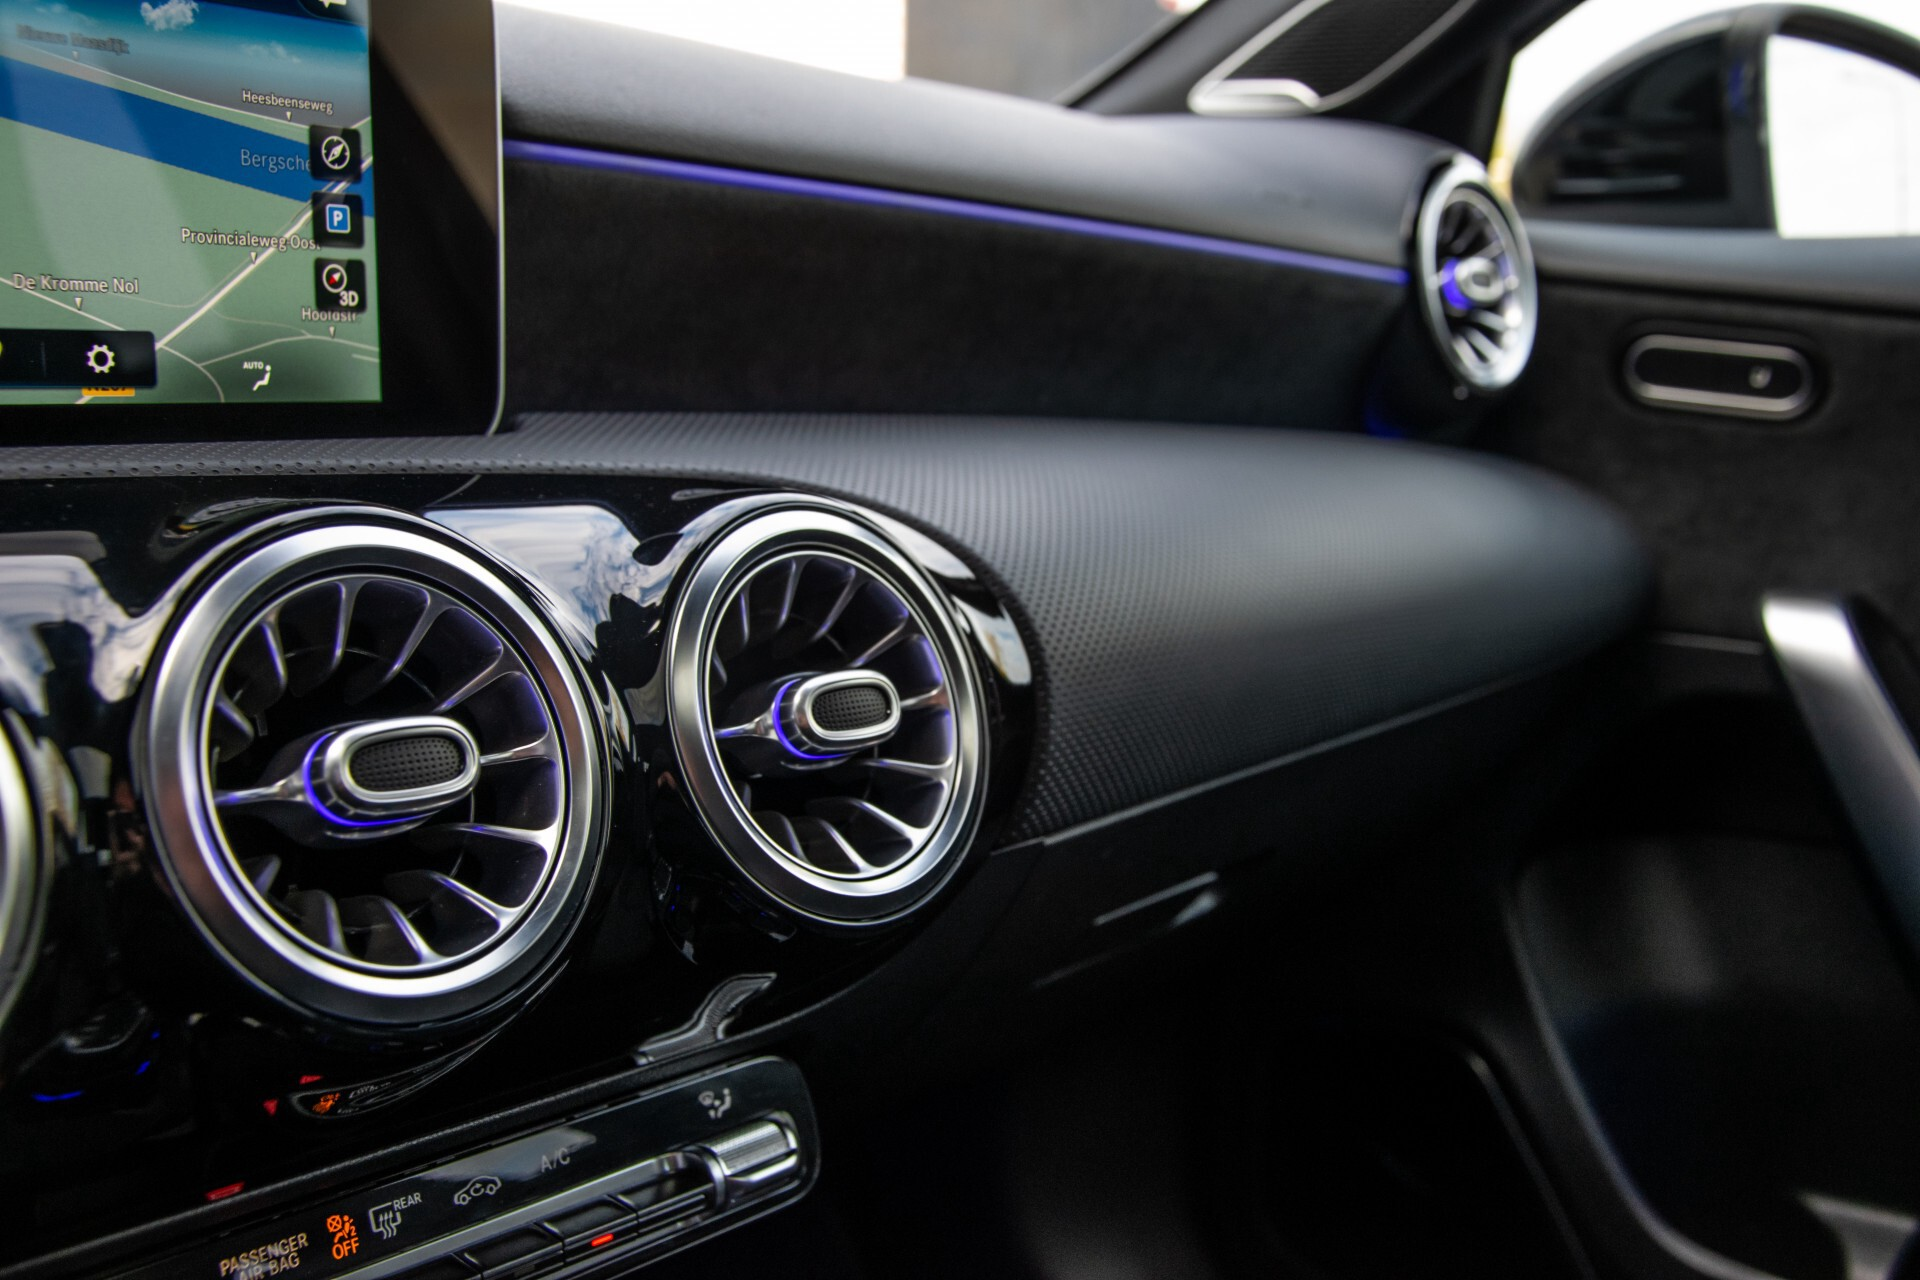 Mercedes-Benz A-Klasse 250 4-M AMG Panorama/Keyless-Entry/MBUX/HUD/Burmester/360/Multibeam LED Aut7 Foto 24